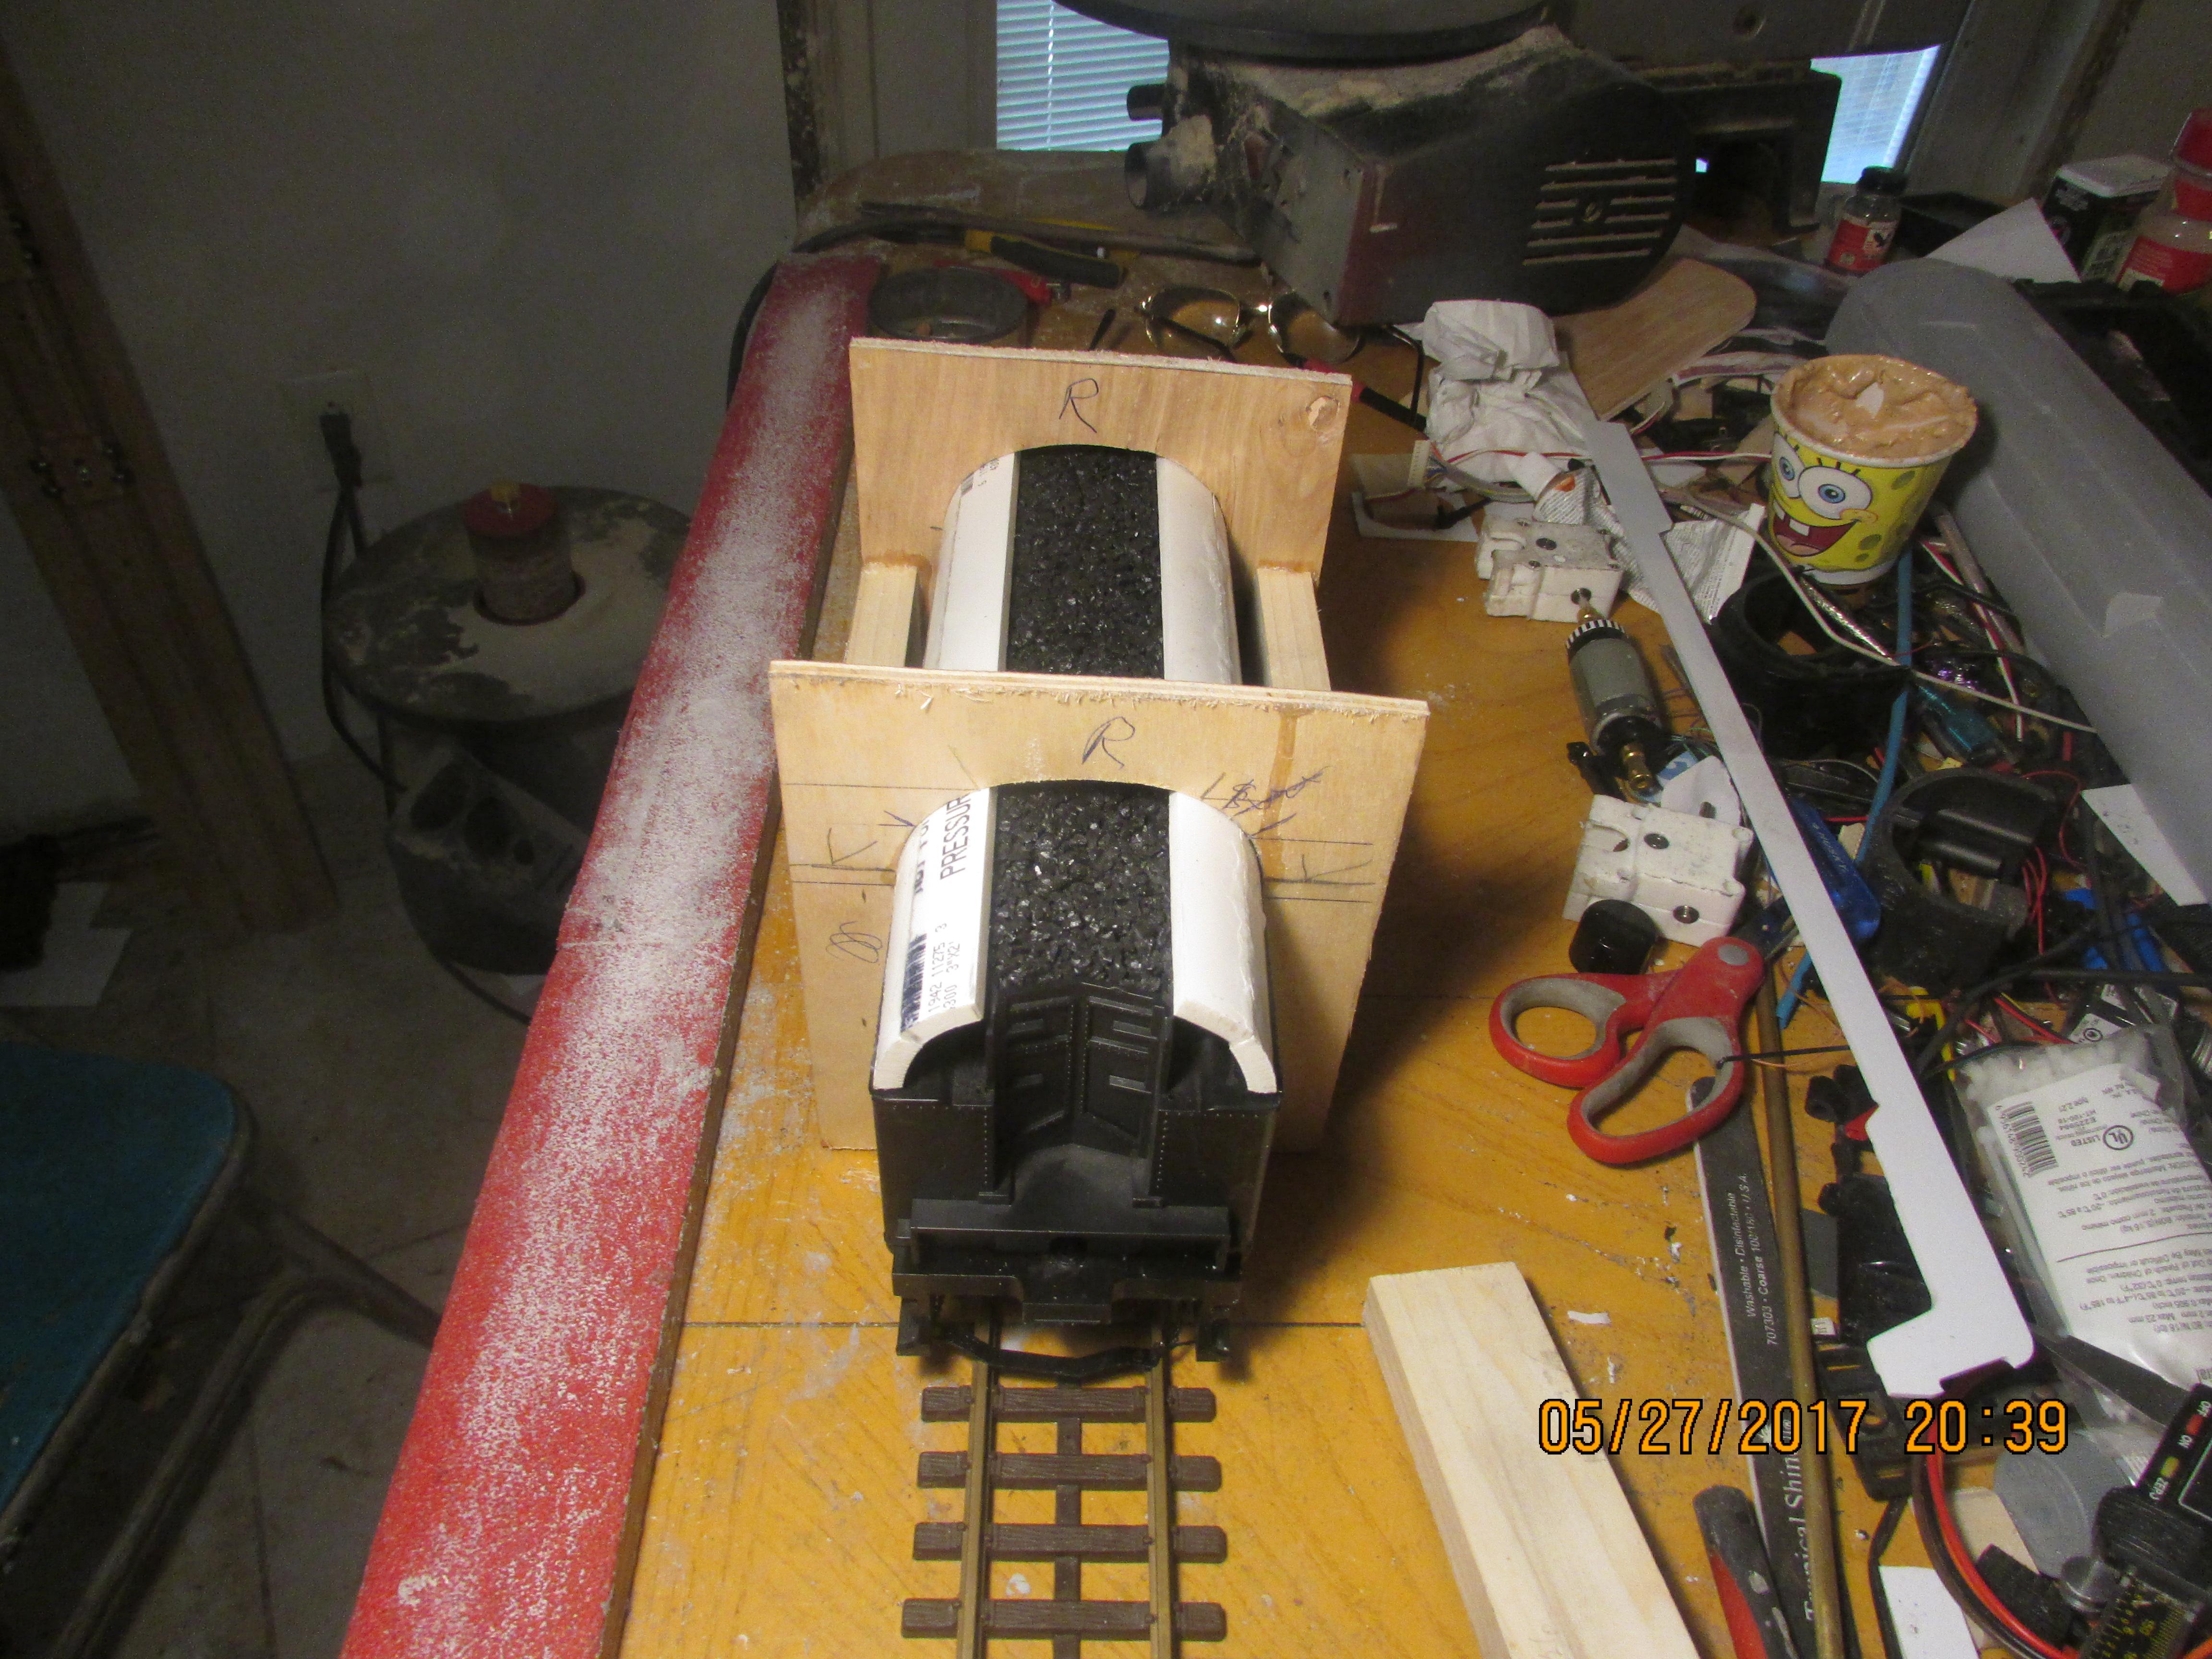 PRR T1 kitbash from 2 Hudsons - Page 6 - Kitbashing & Model